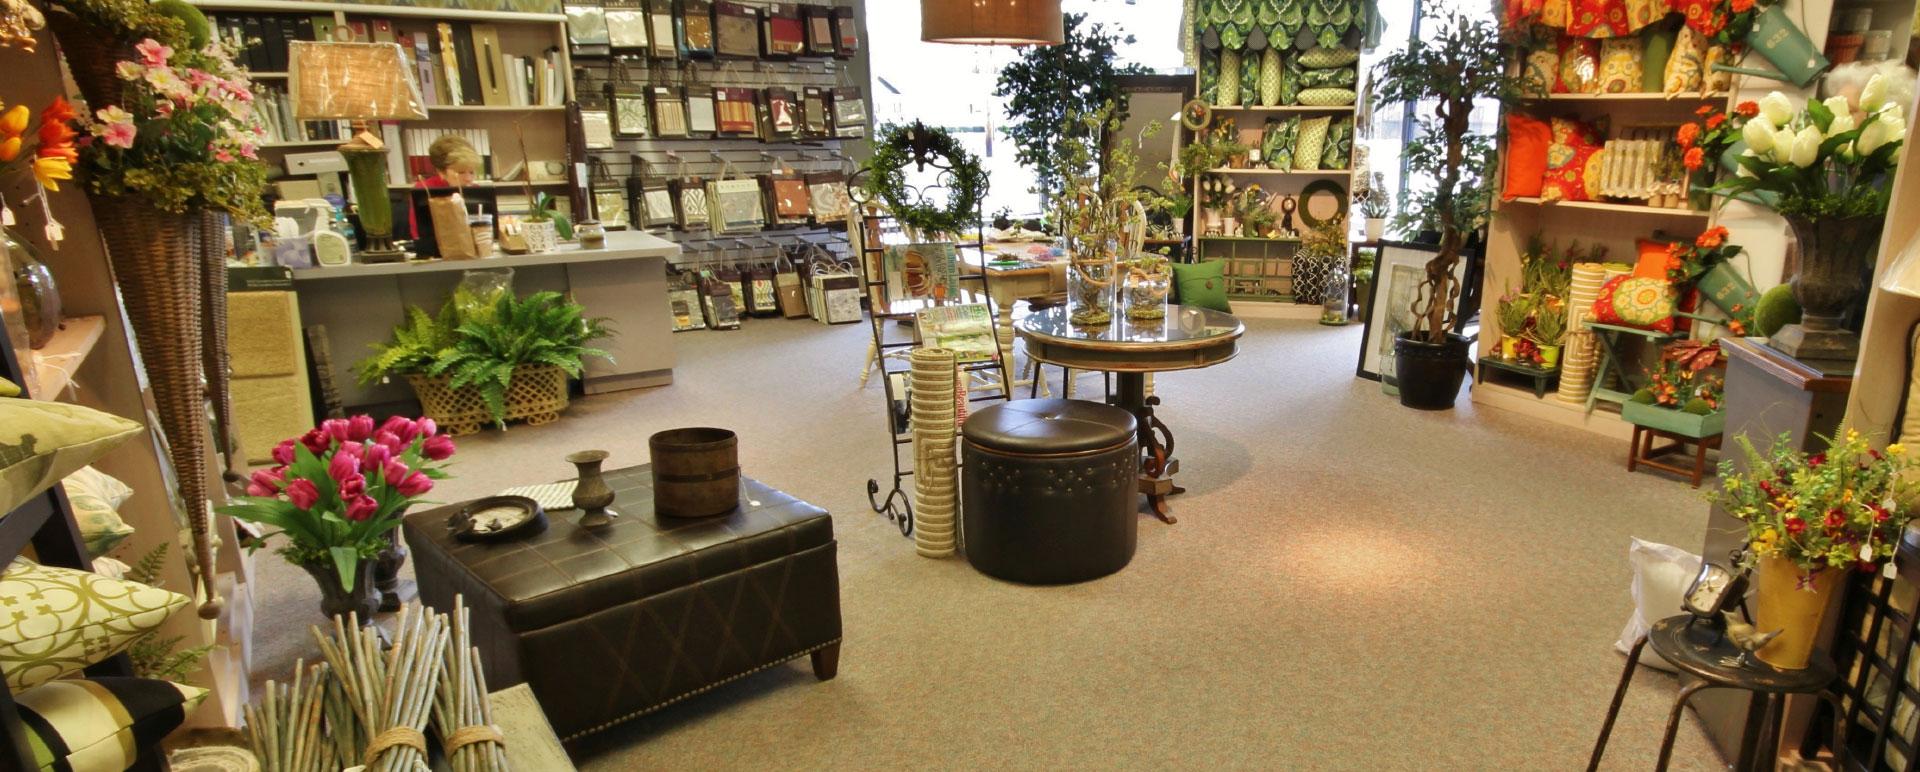 Modern Glass Paint and Tile Company - Zanesville, Ohio